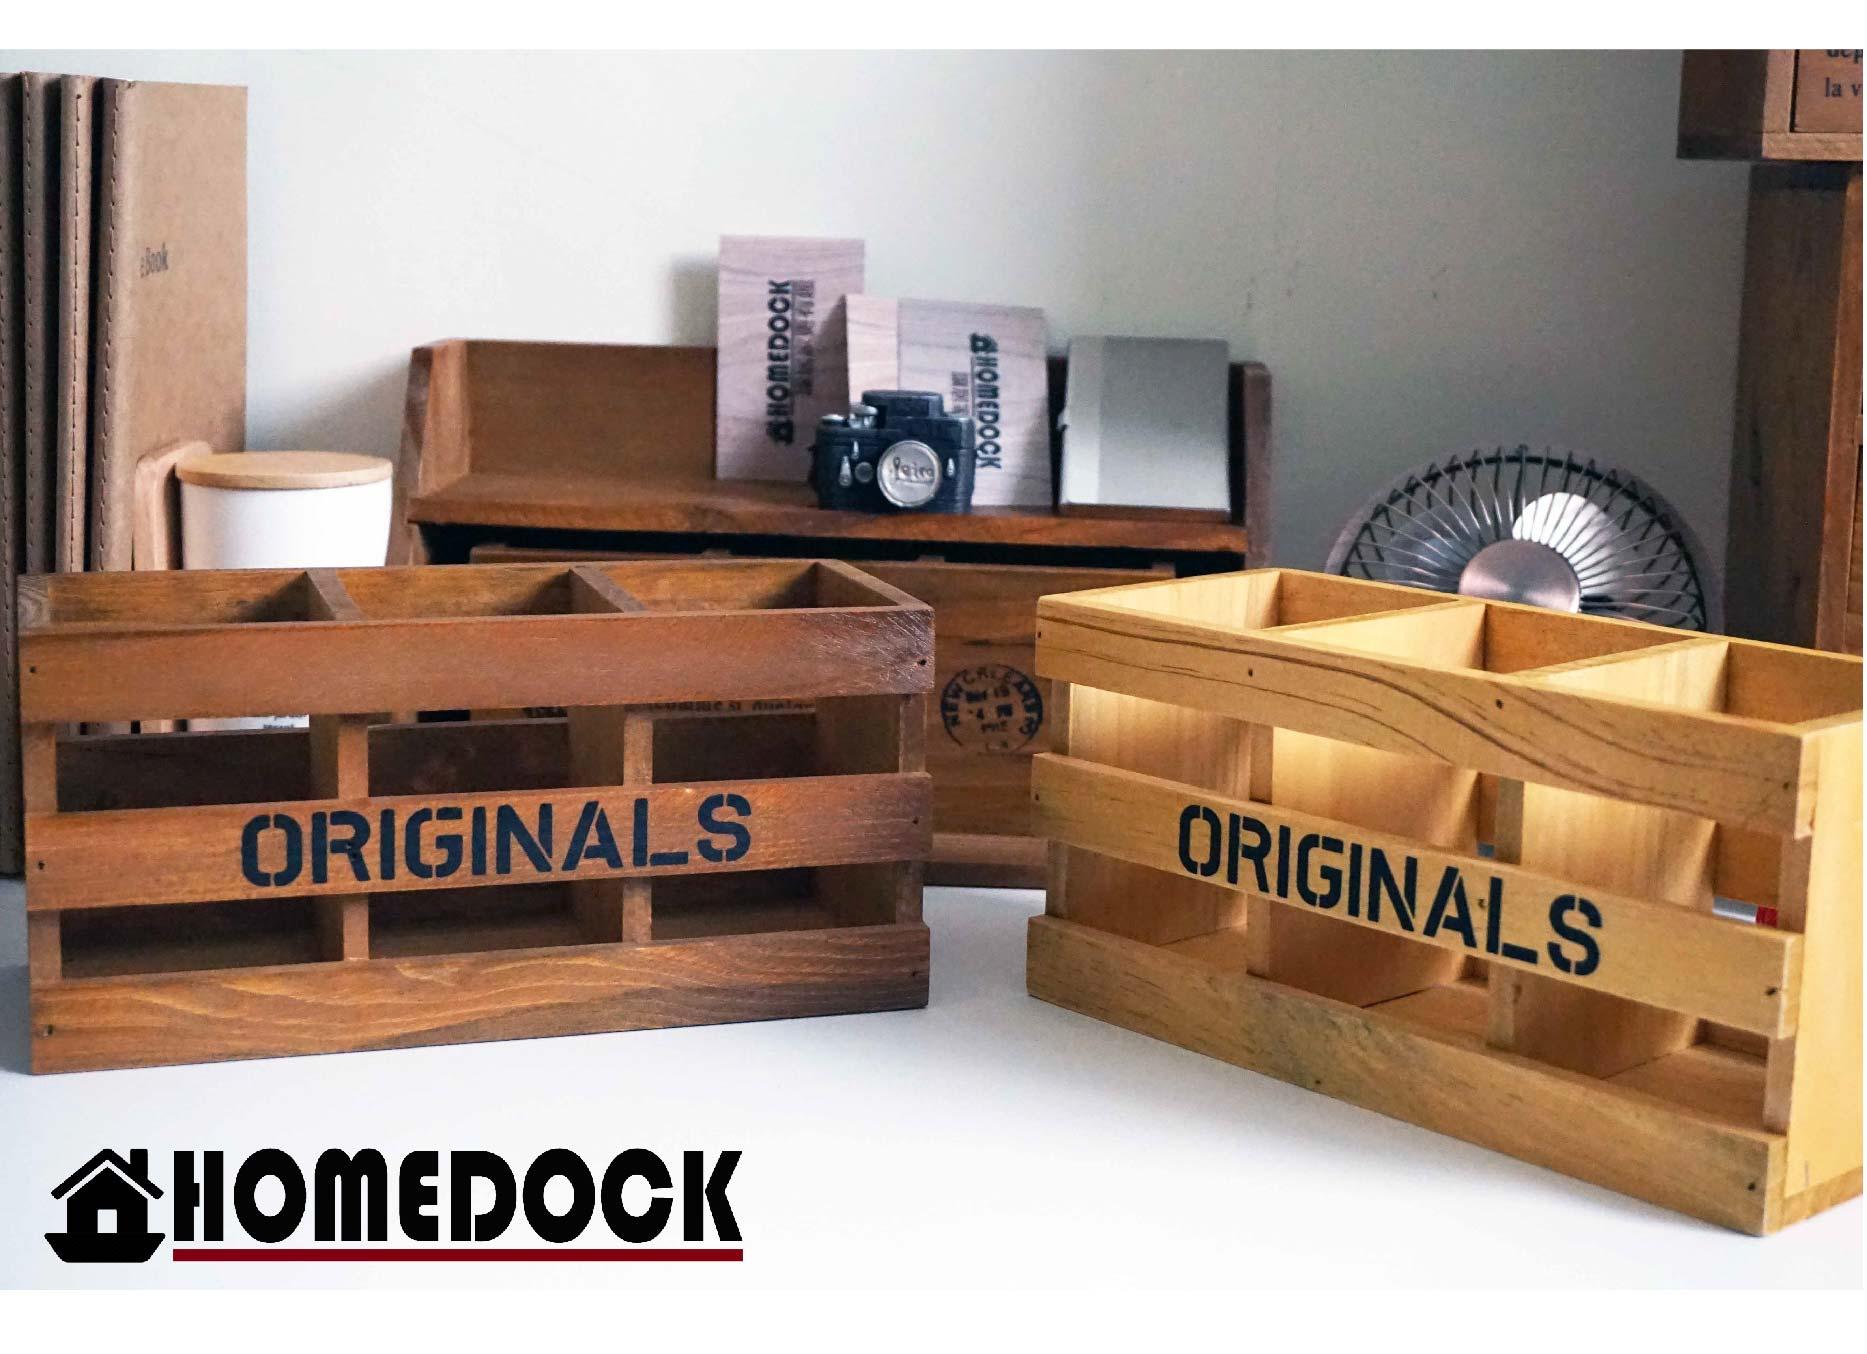 HOMEDOCK~長方書桌收納盒 木櫃 置物櫃 Zakka 雜貨 原木製 層格櫃 抽屜 雙